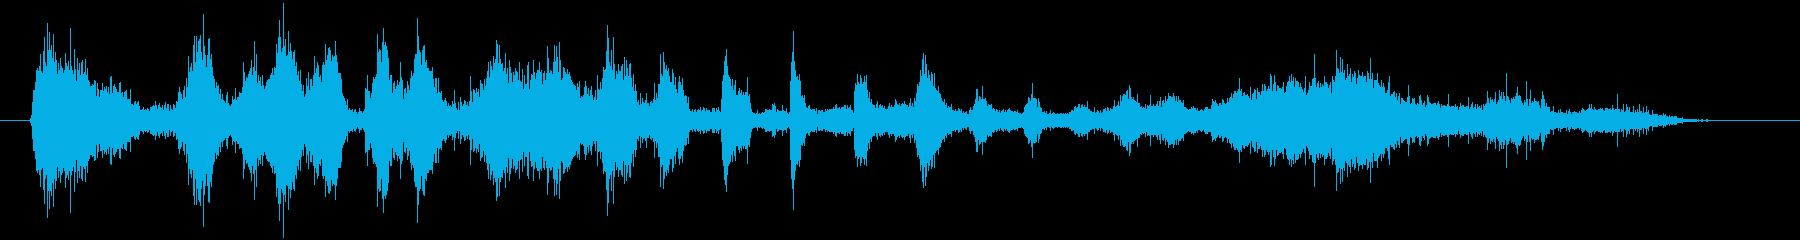 蒸気放出弁:小型圧力放出、排気、空...の再生済みの波形